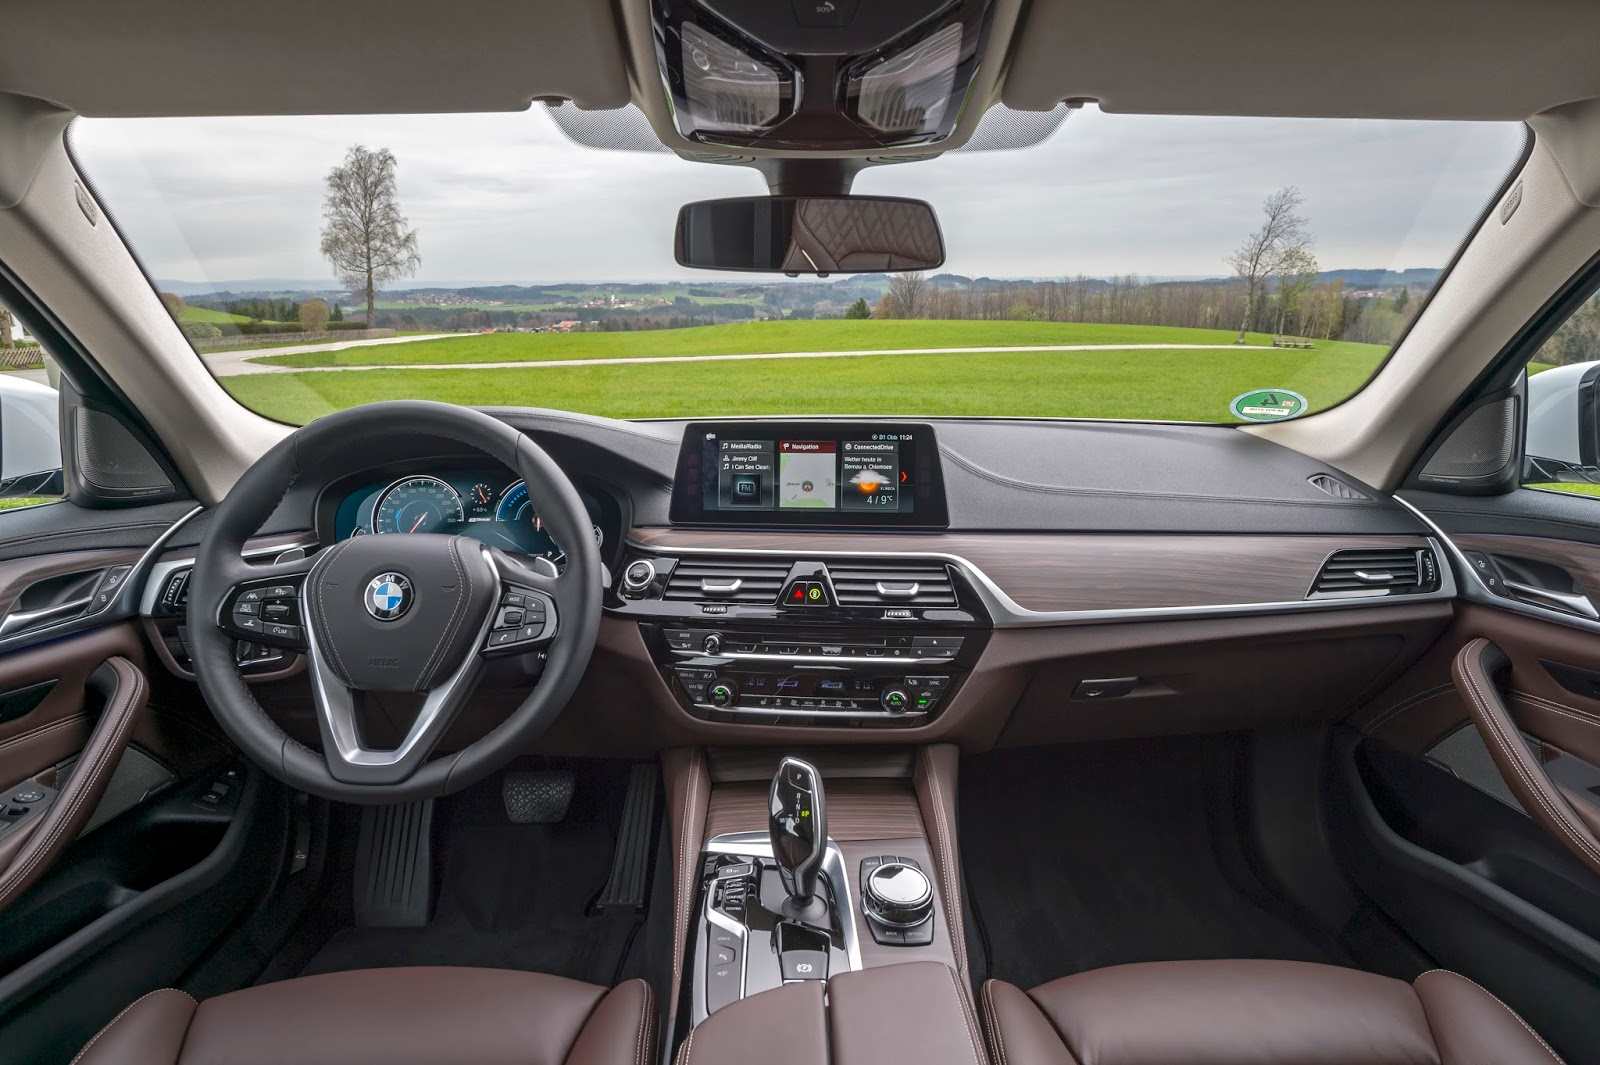 P90256377 highRes the new bmw 530e ipe Η BMW 530e iPerformance φέρνει την ηλεκτρική επανάσταση BMW, BMW 5, BMW 530e iPerformance, Electric cars, Hybrid, Λανσάρισμα